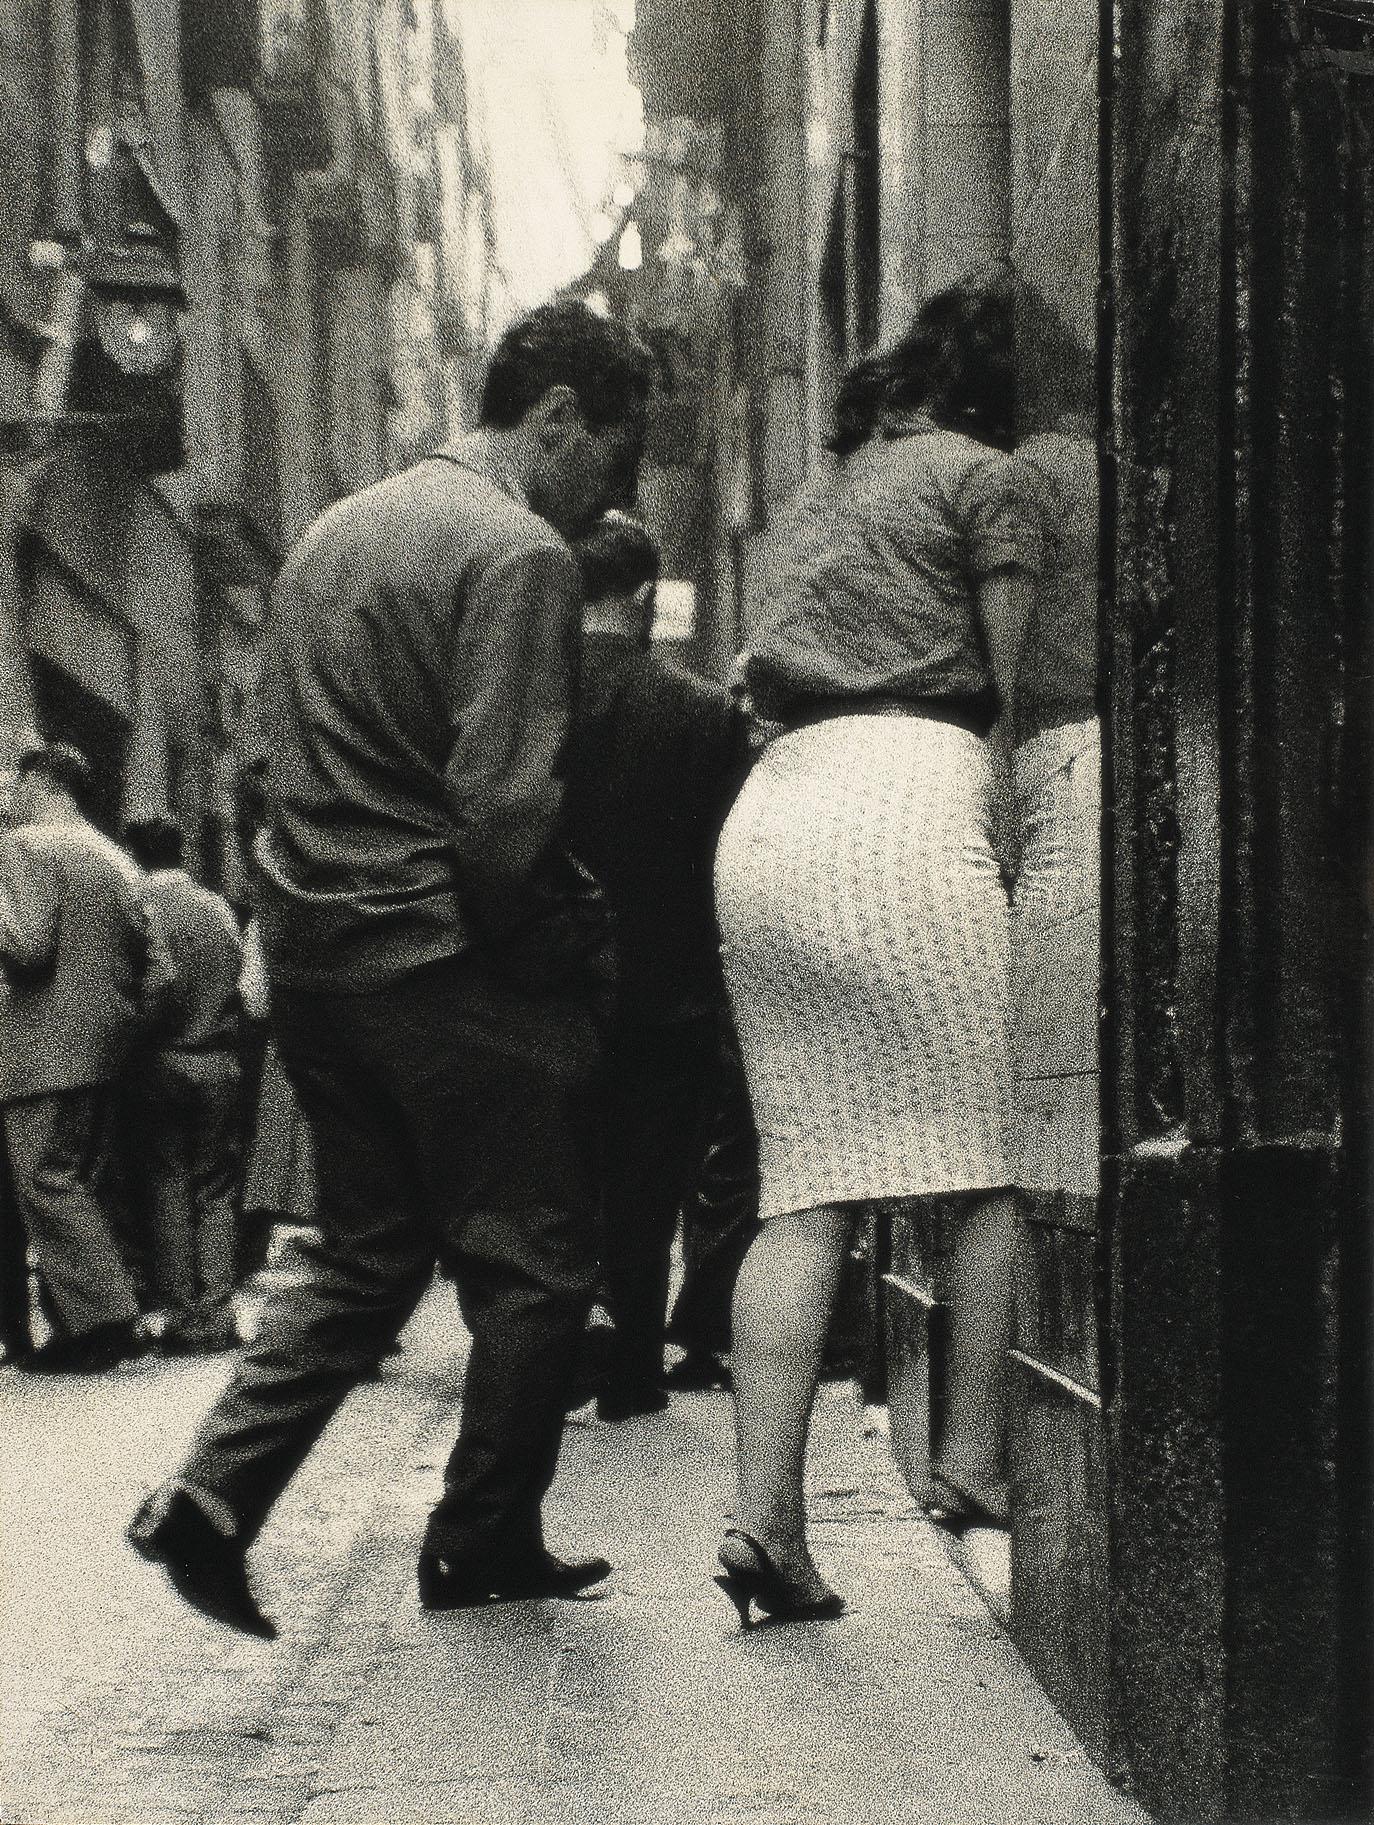 Joan Colom Altemir - De la sèrie Districte 5è - Barcelona, cap a 1960